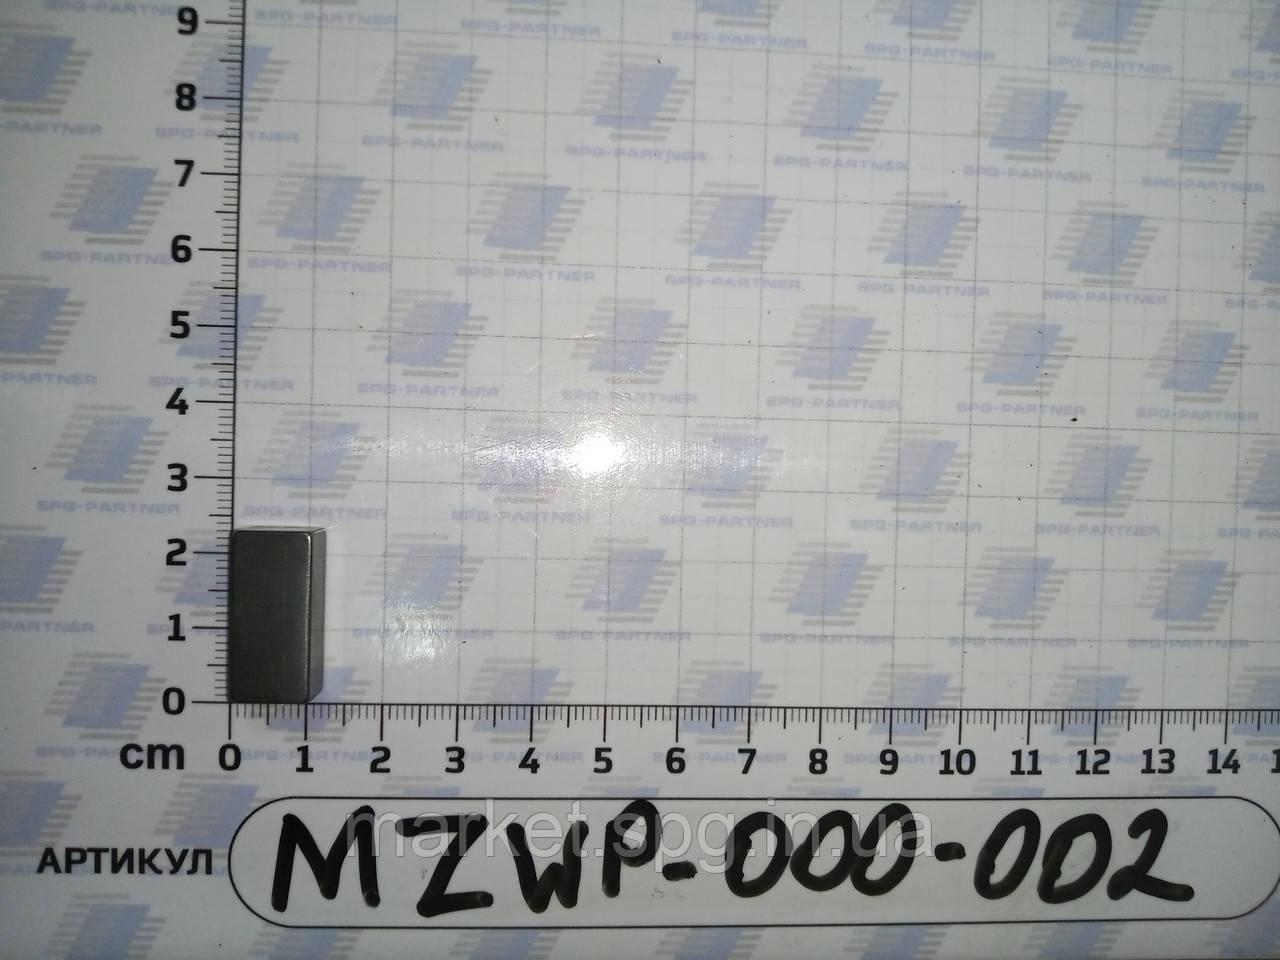 MZWP-000-002 Шпонка призматична 10х8х22 В SaMASZ